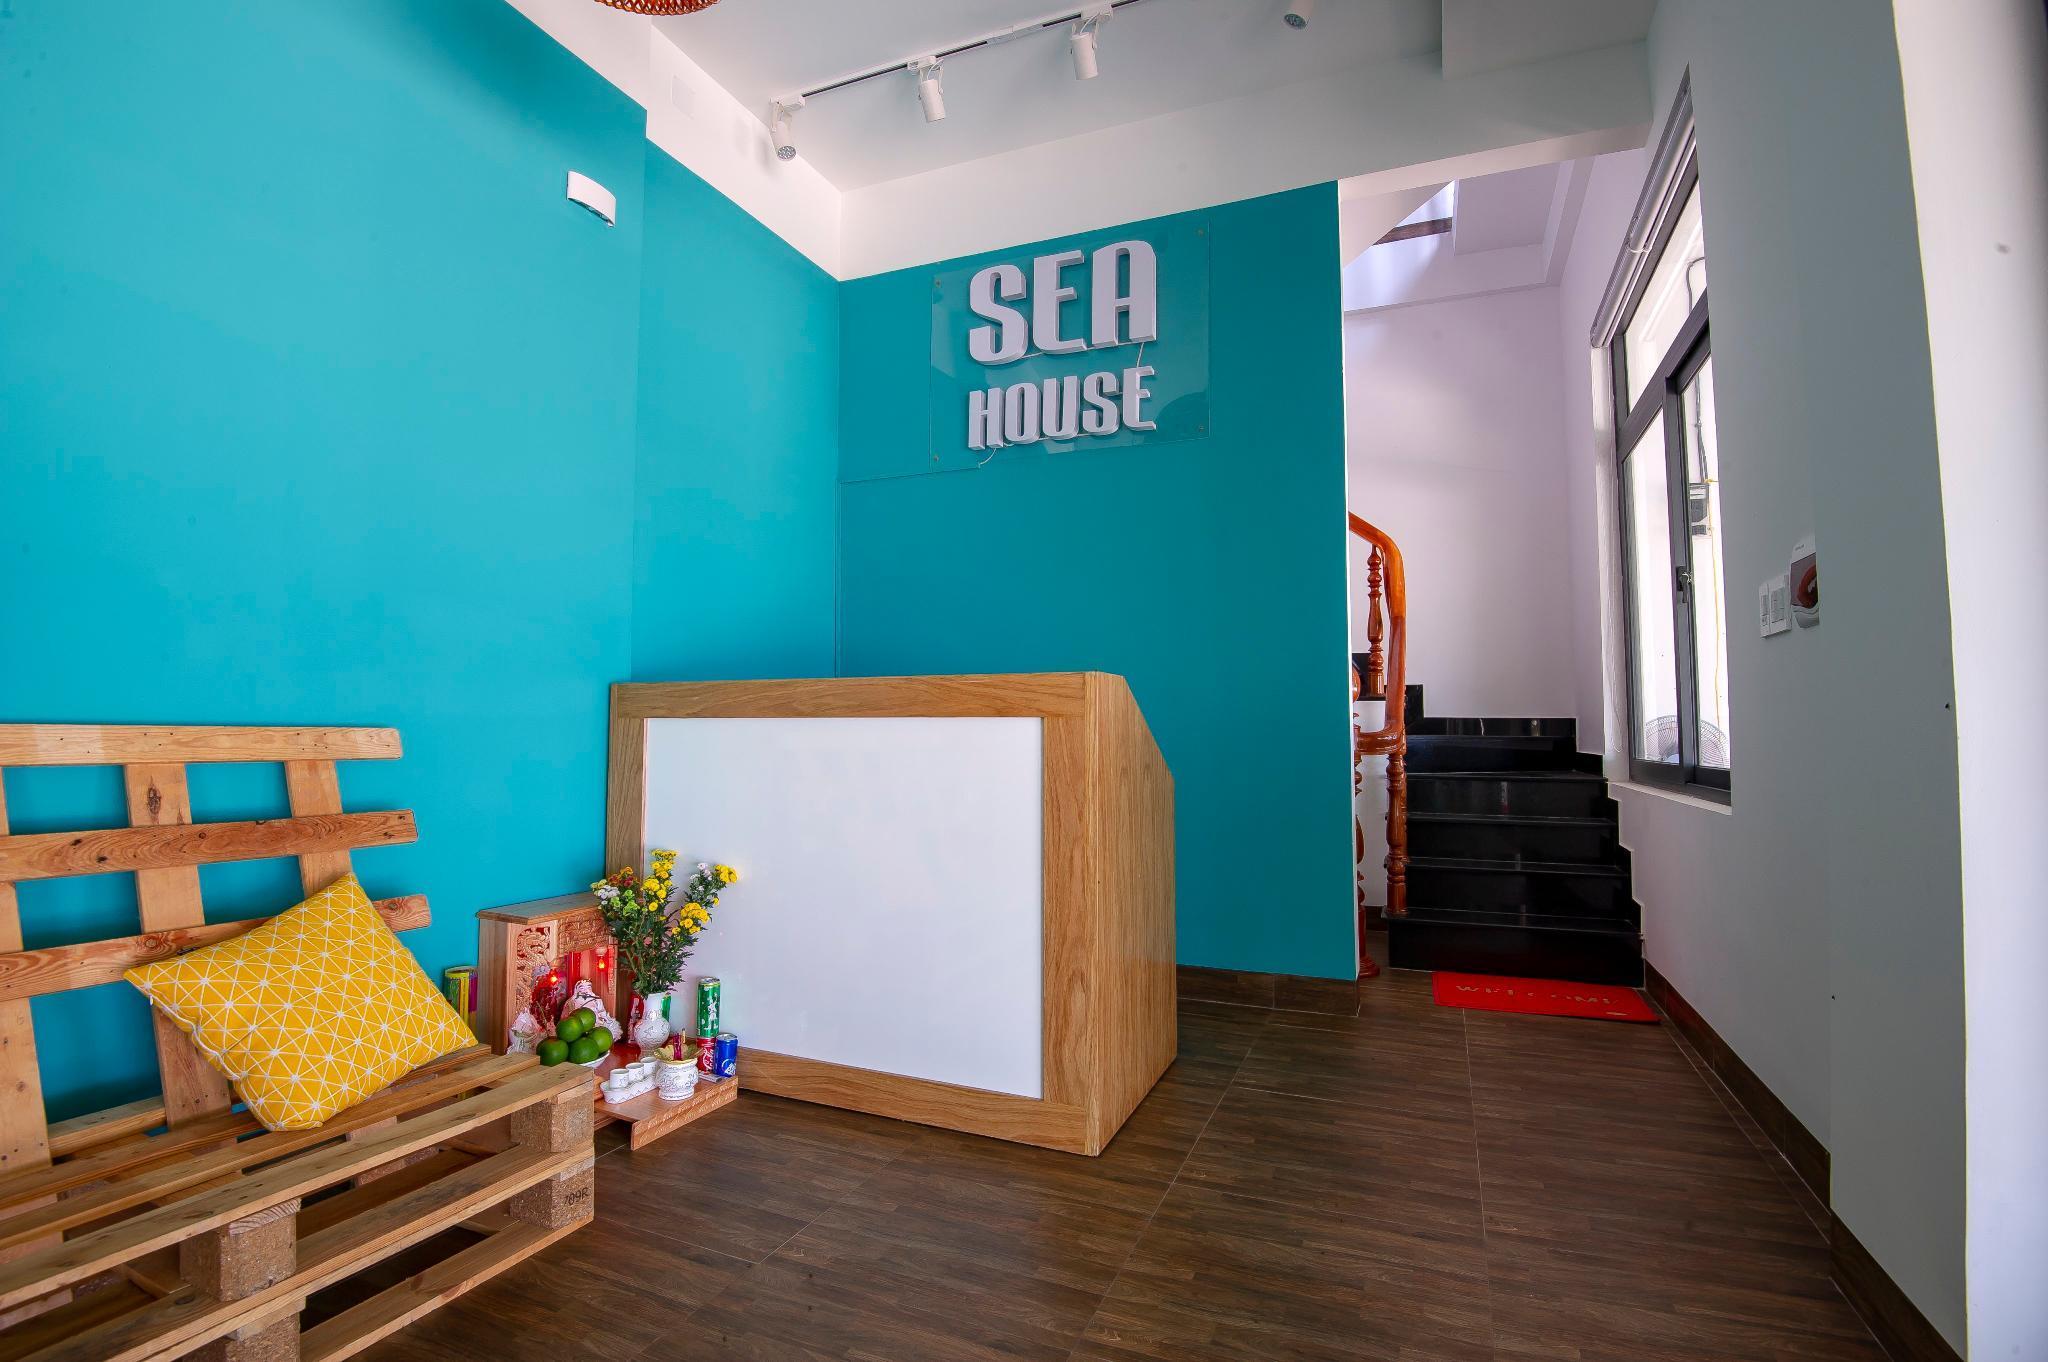 SEA HOUSE CU LAO XANH